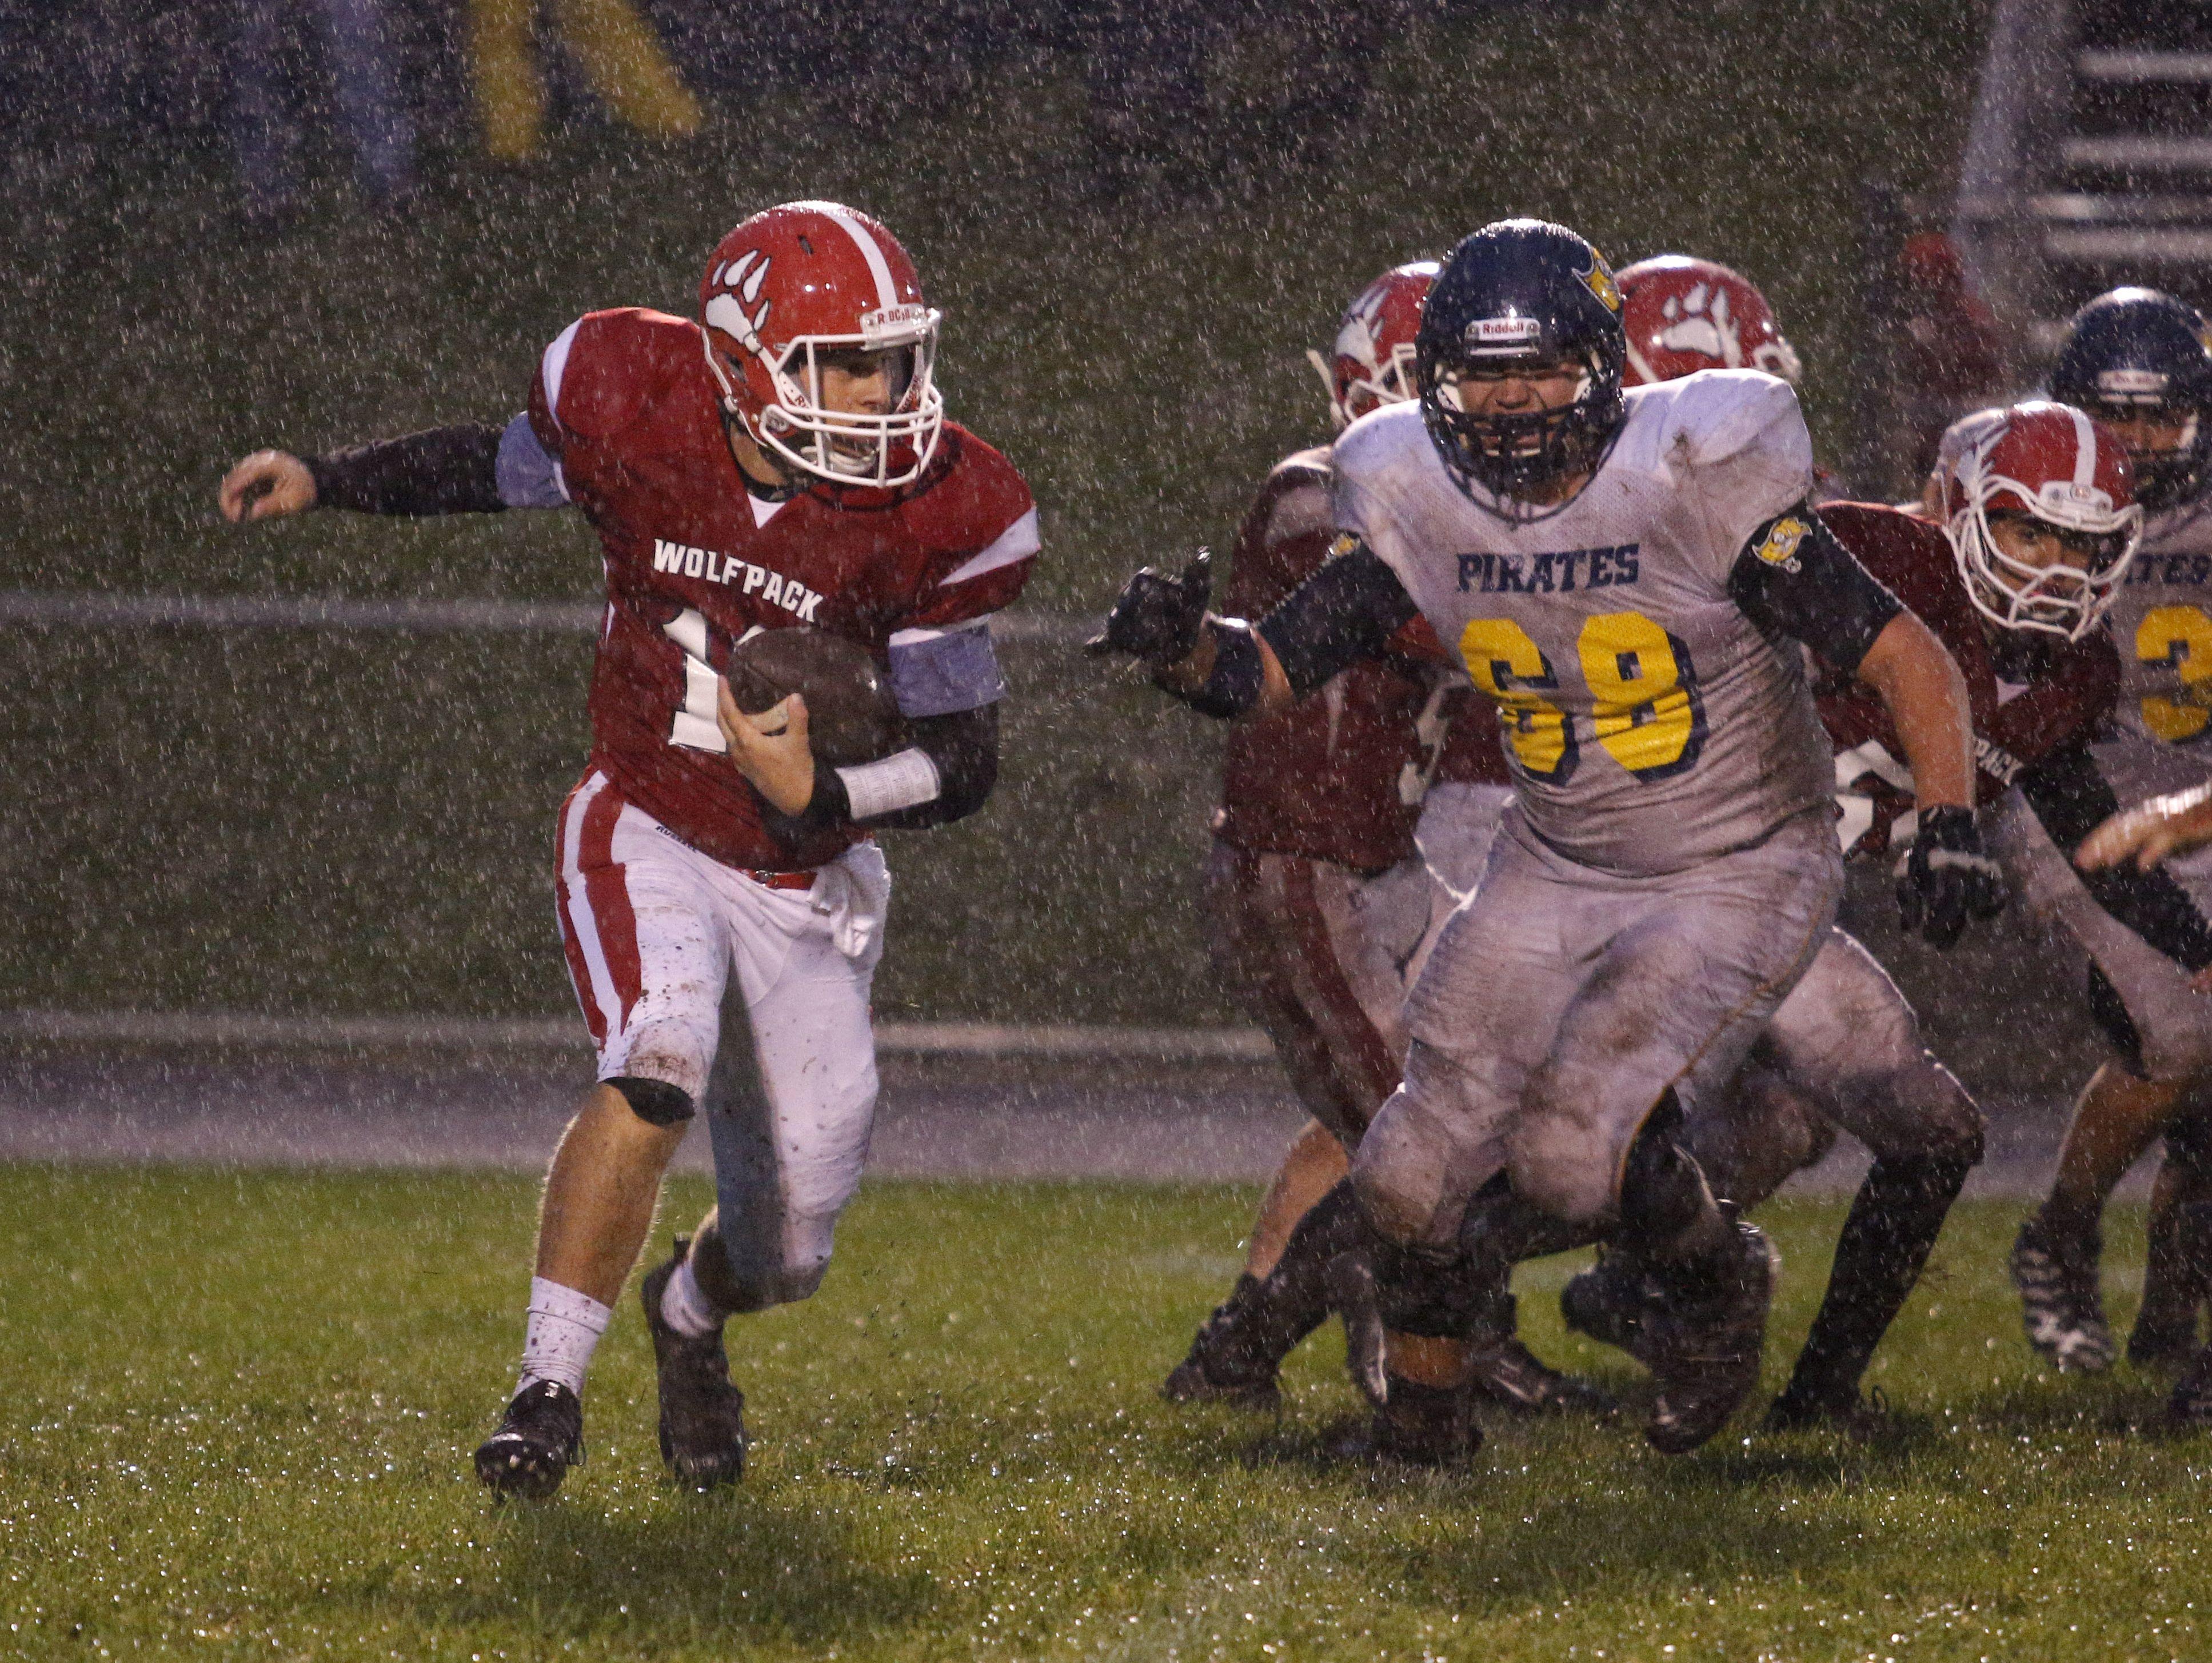 Laingsburg quarterback Nick Putnam, left, runs on a keeper against Pewamo-Westphalia's Isaiah Schafer Friday, Sept. 30, 2016, in Laingsburg, Mich.